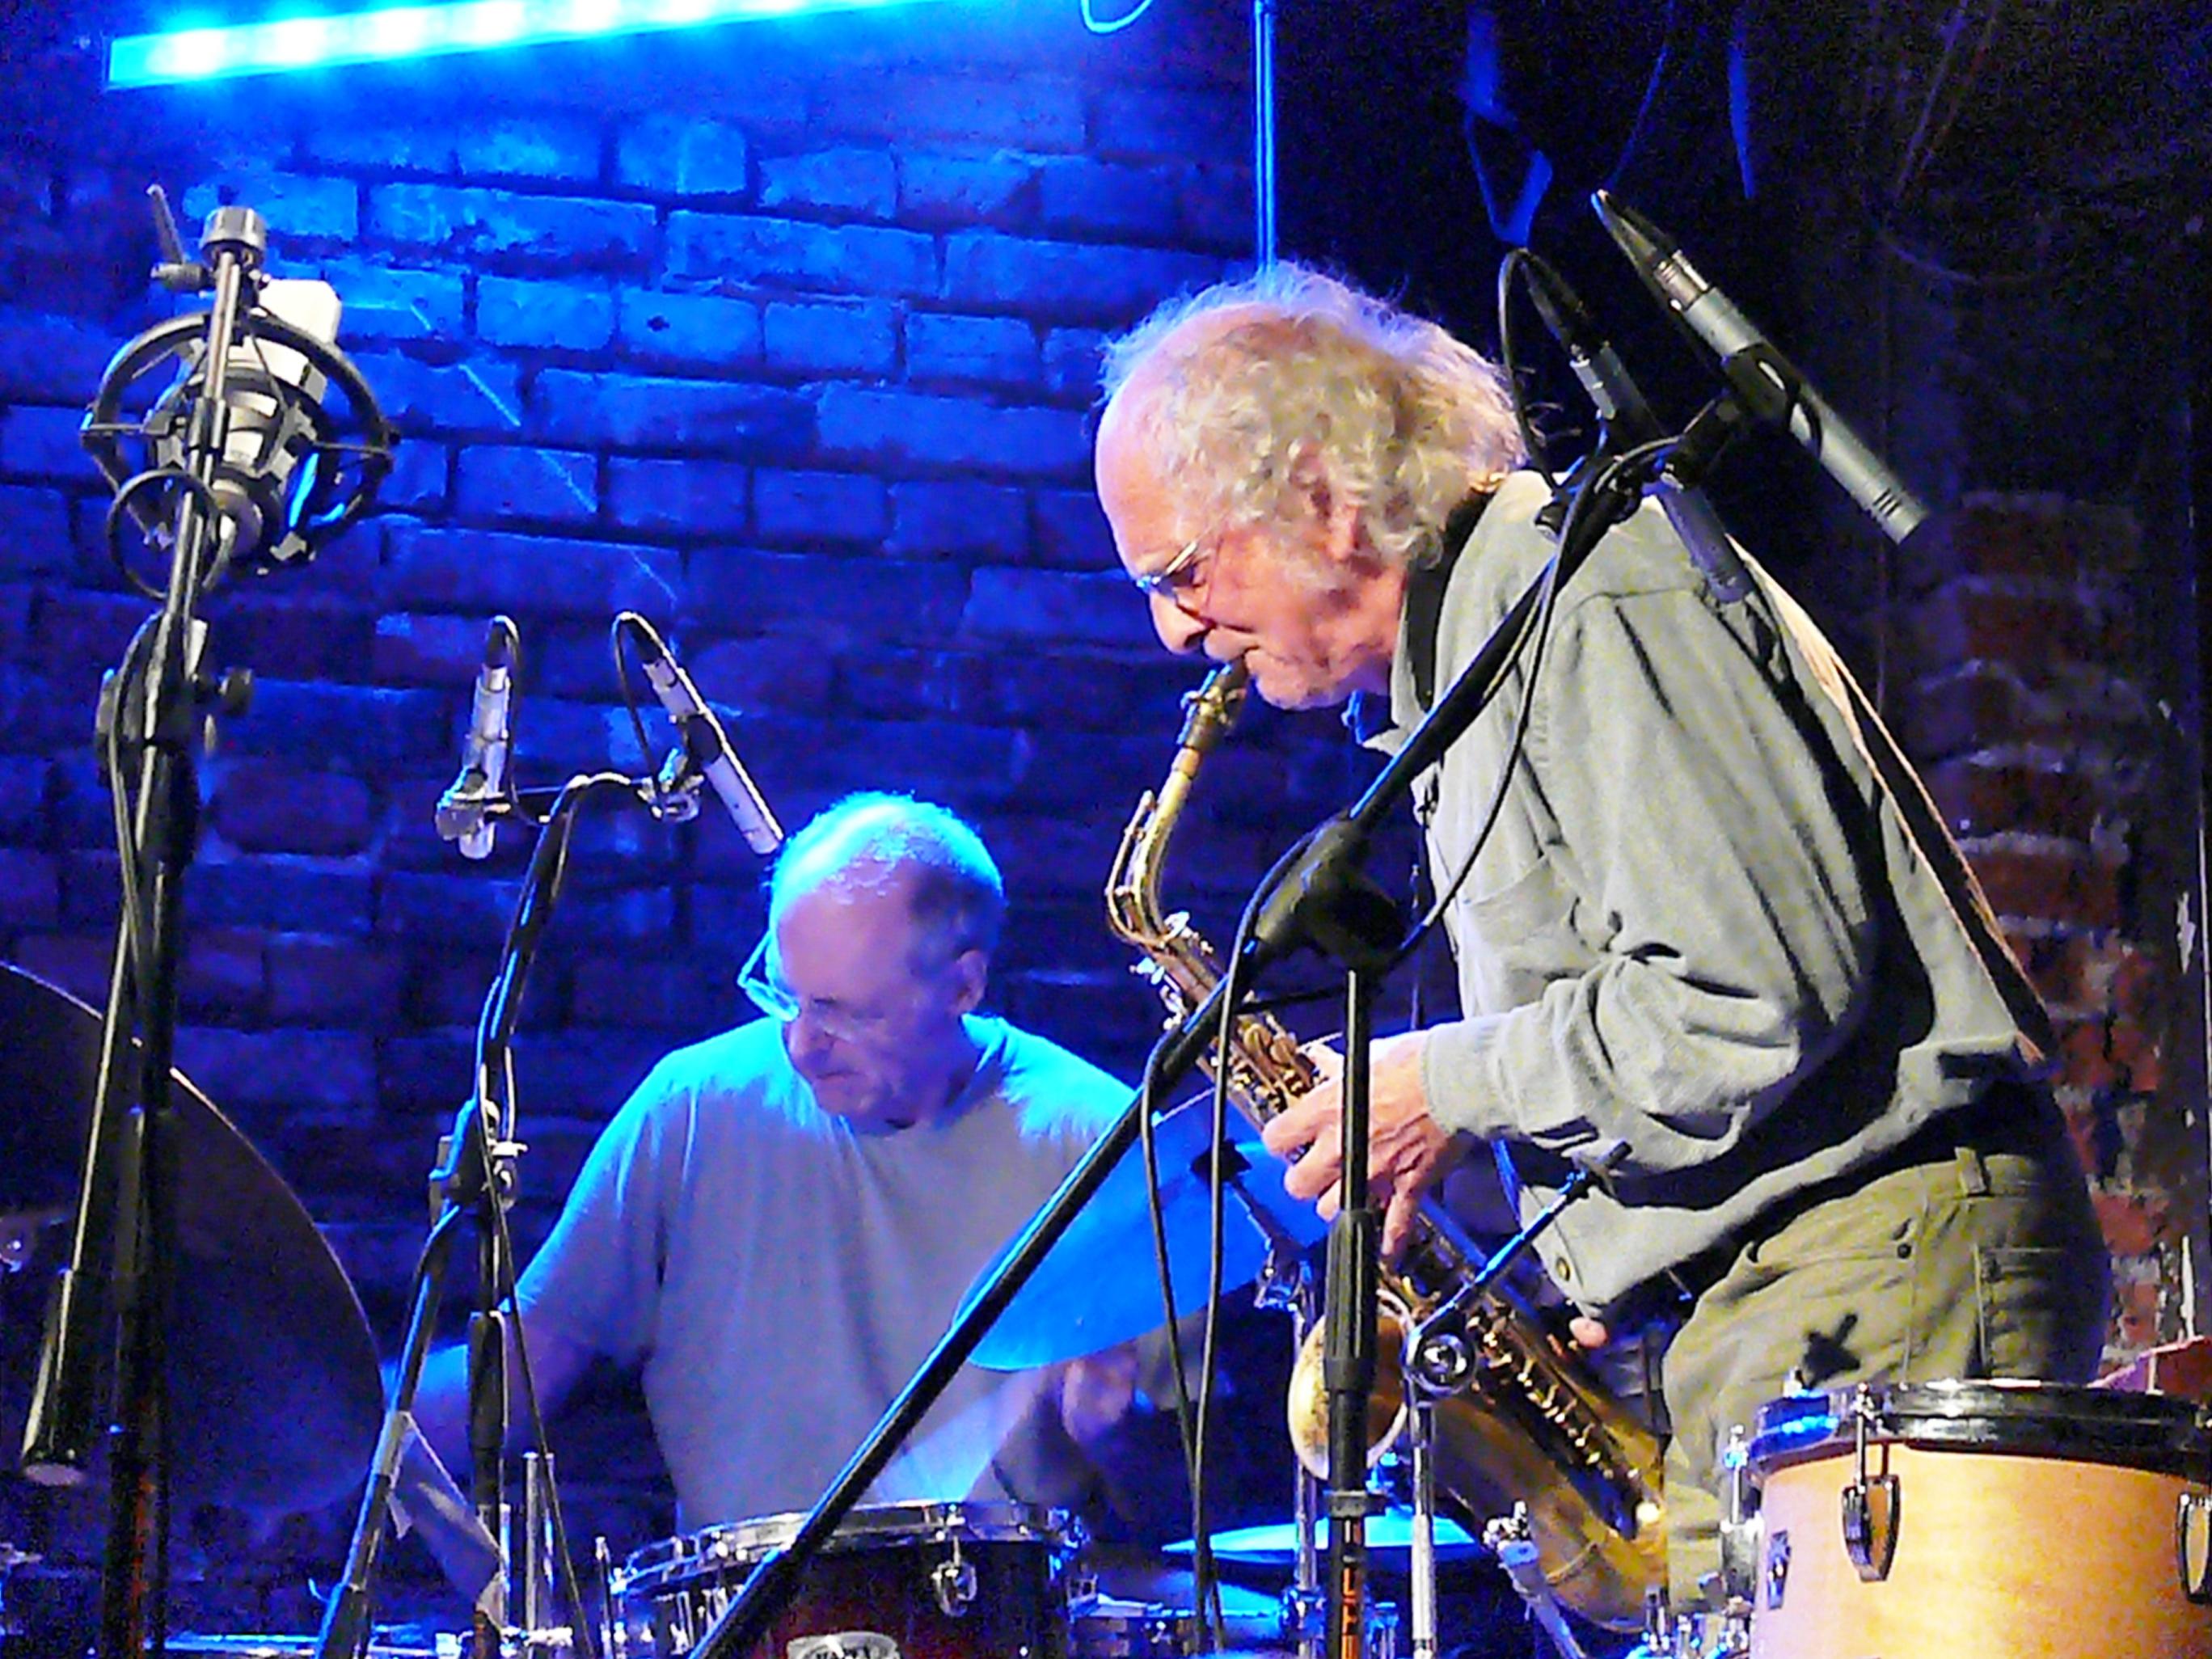 Paul Lytton and Trevor Watts at Alchemia, Krakow in November 2012